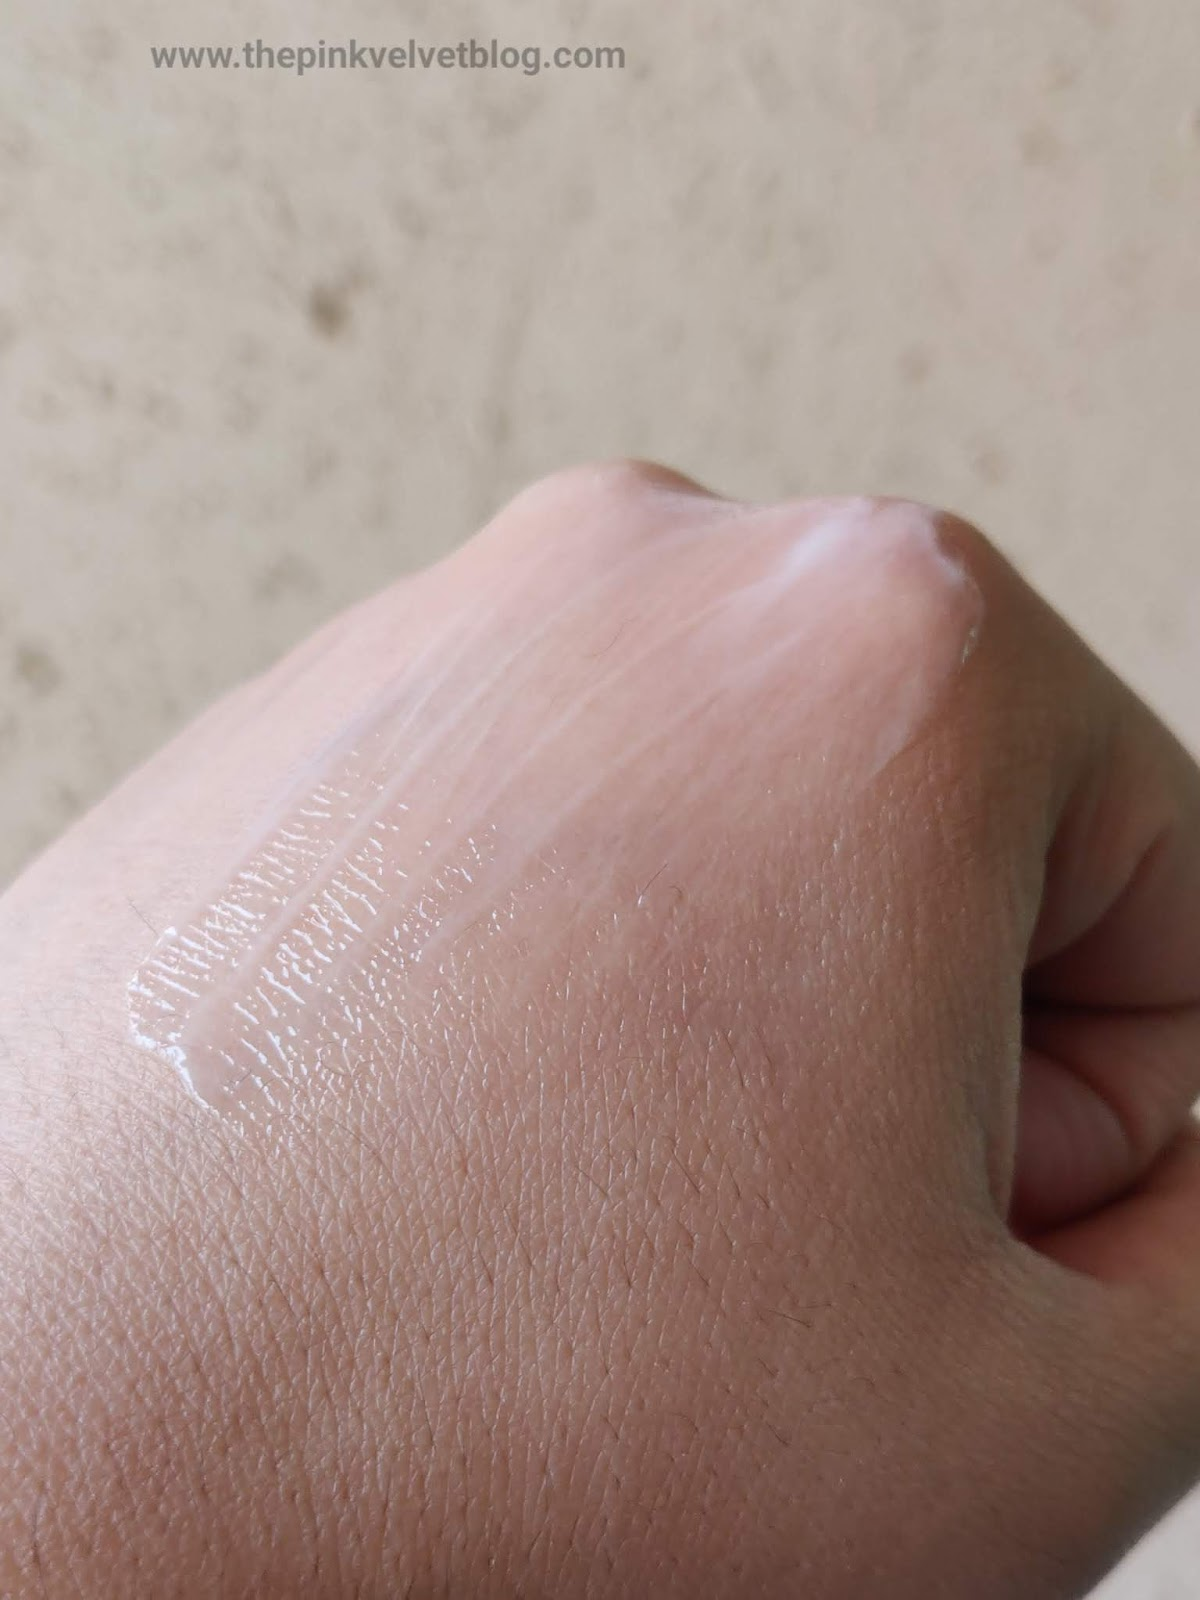 Simple Skincare Hydrating Light Moisturizer for Sensitive Skin